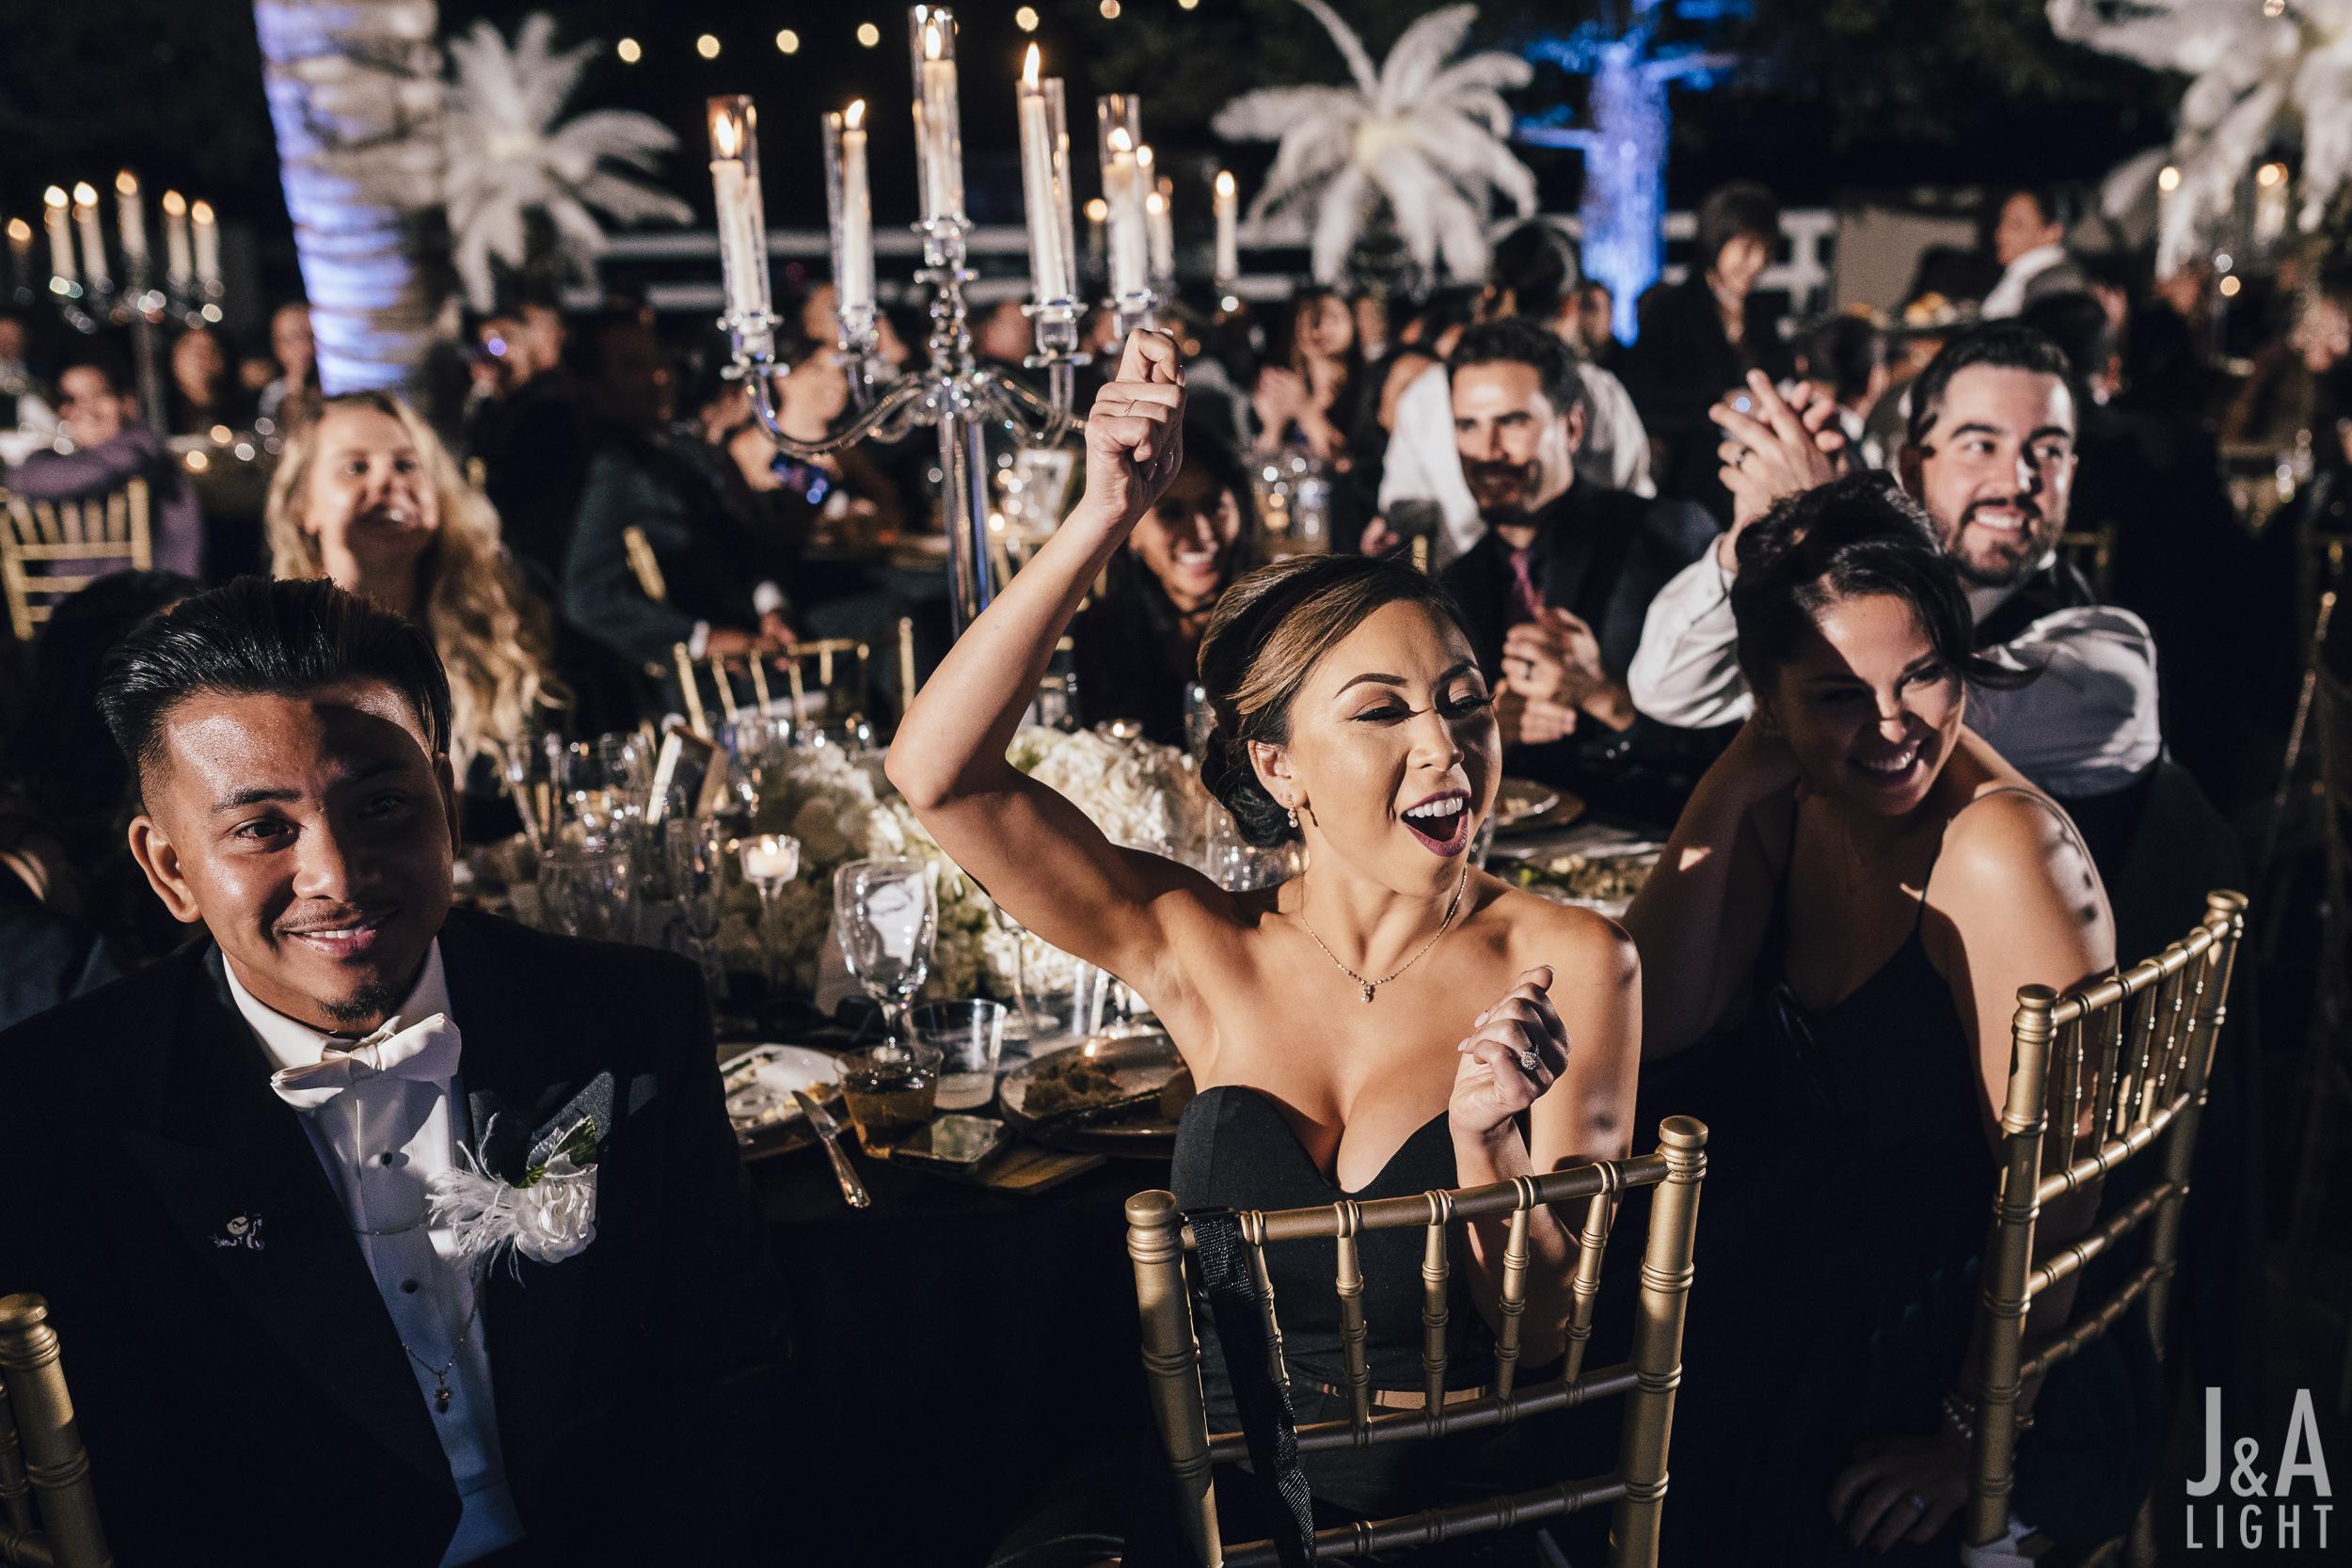 20171014-JanDan-LosBanos-GlassMansion-Wedding-Blog-073.jpg